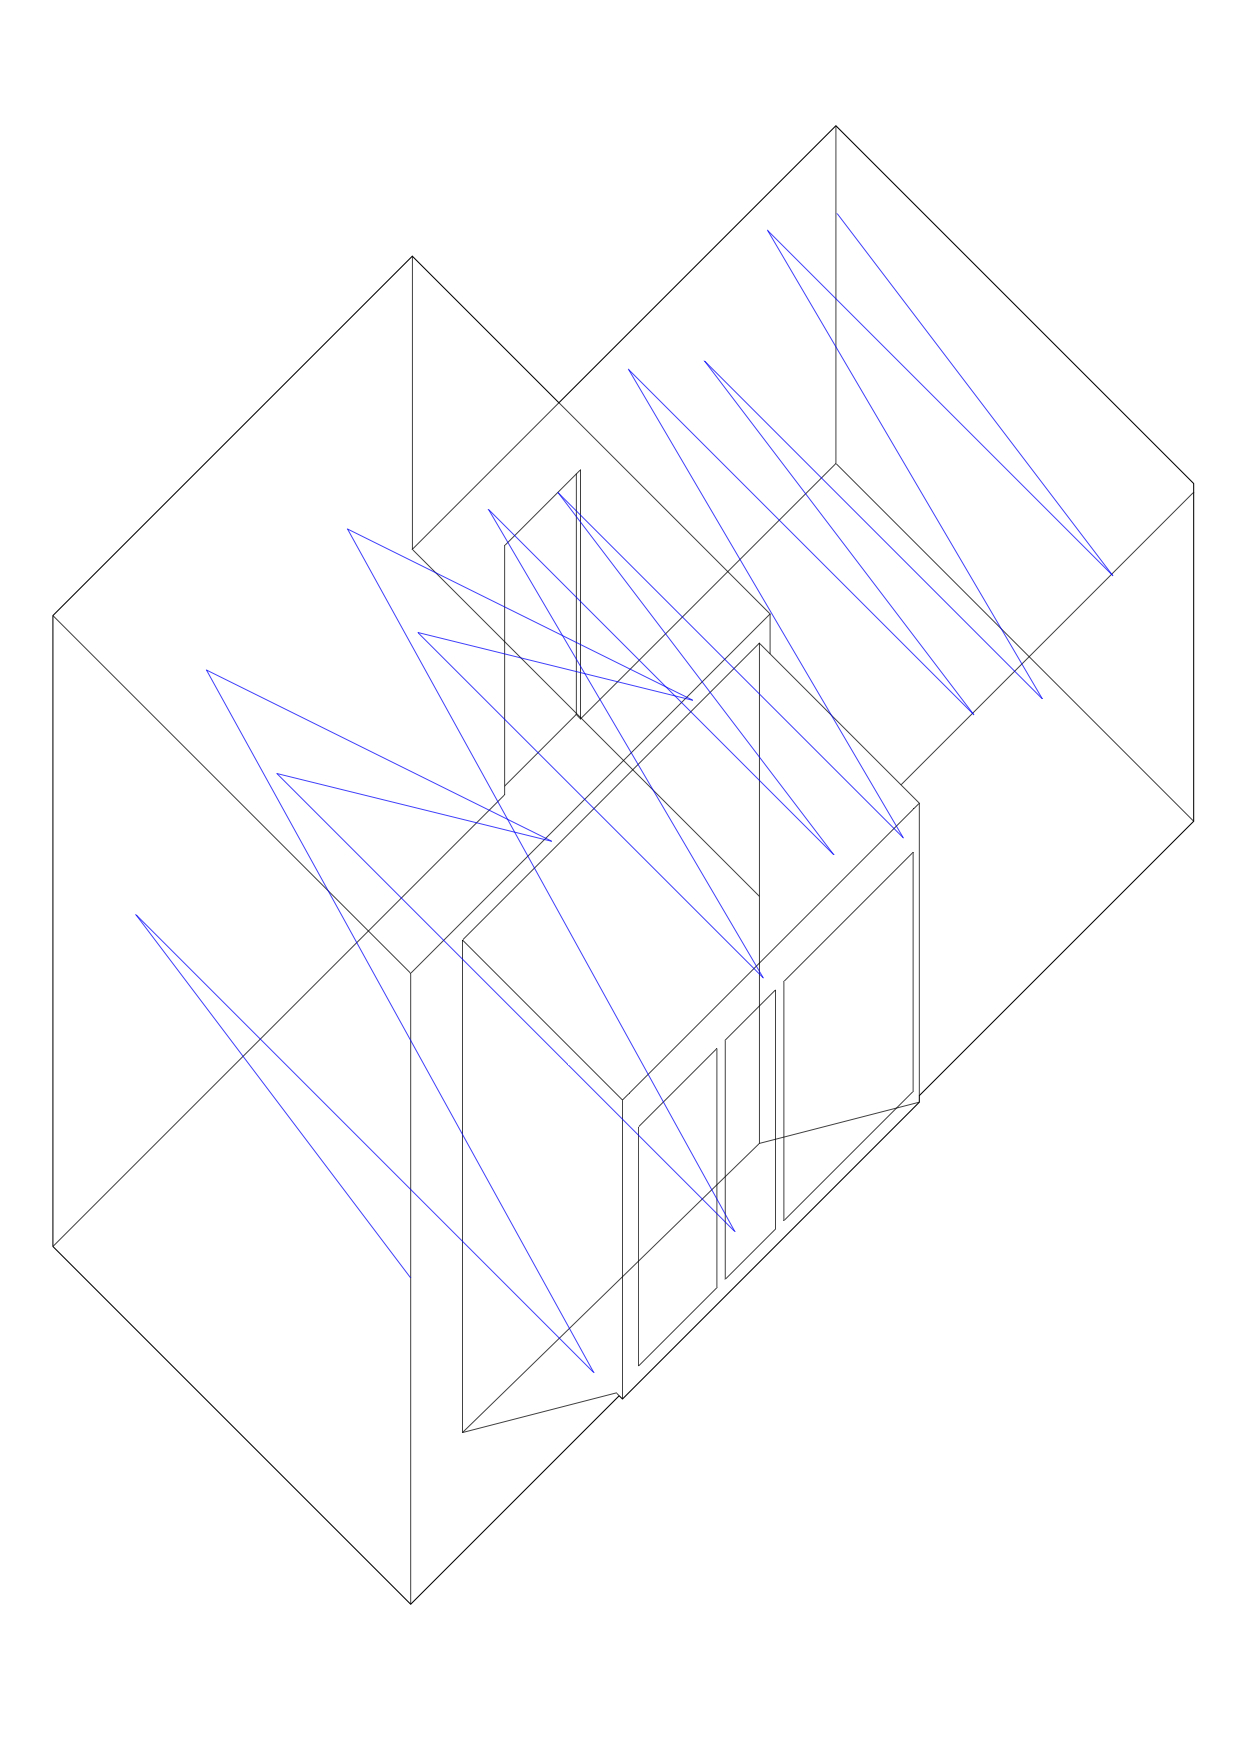 BNKR_Architektur_002